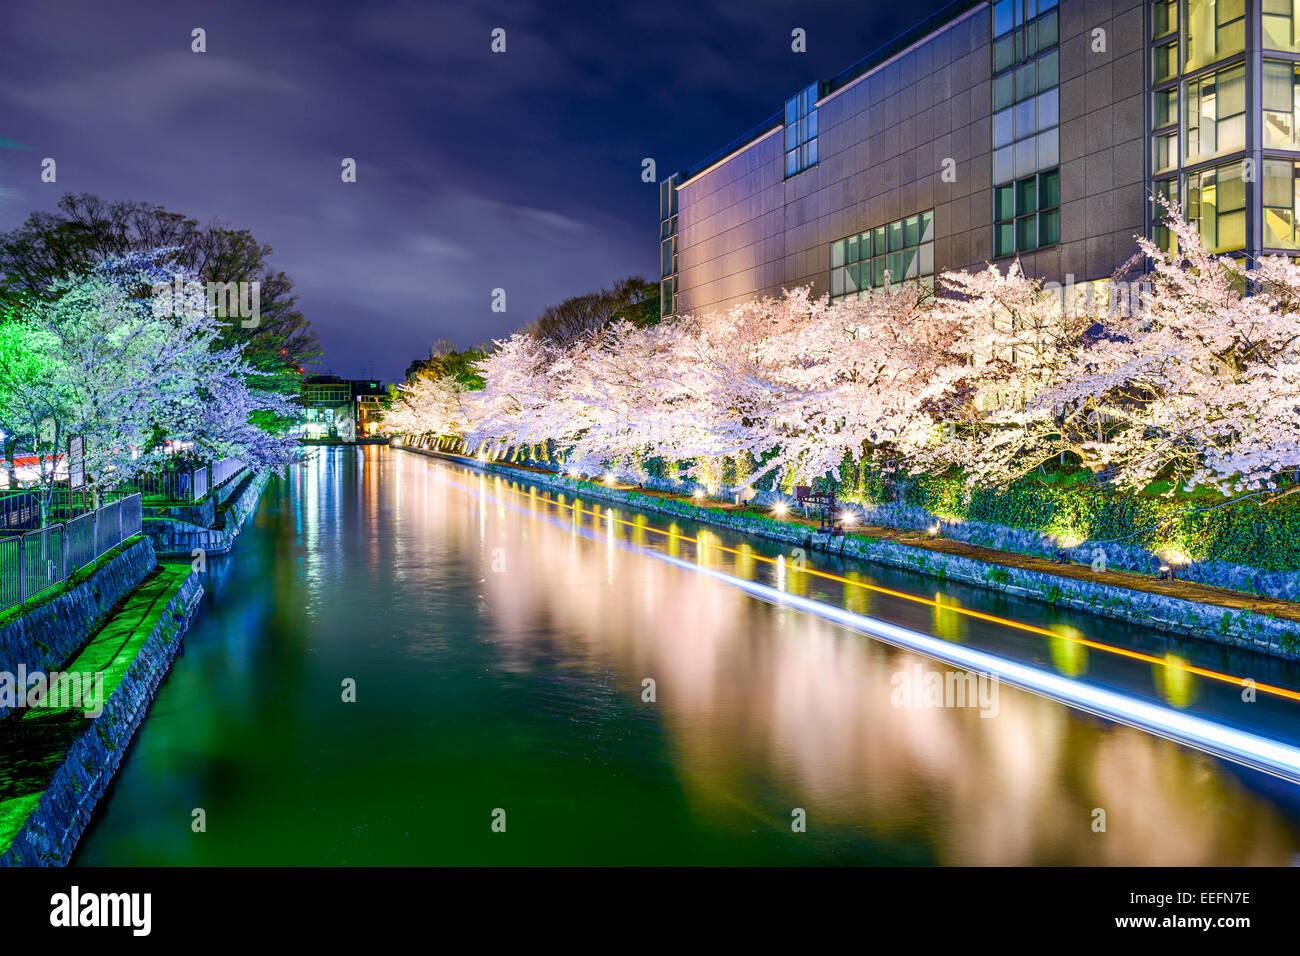 Kyoto, Japan at Okazaki Canal during the spring cherry blossom season. - Stock Image